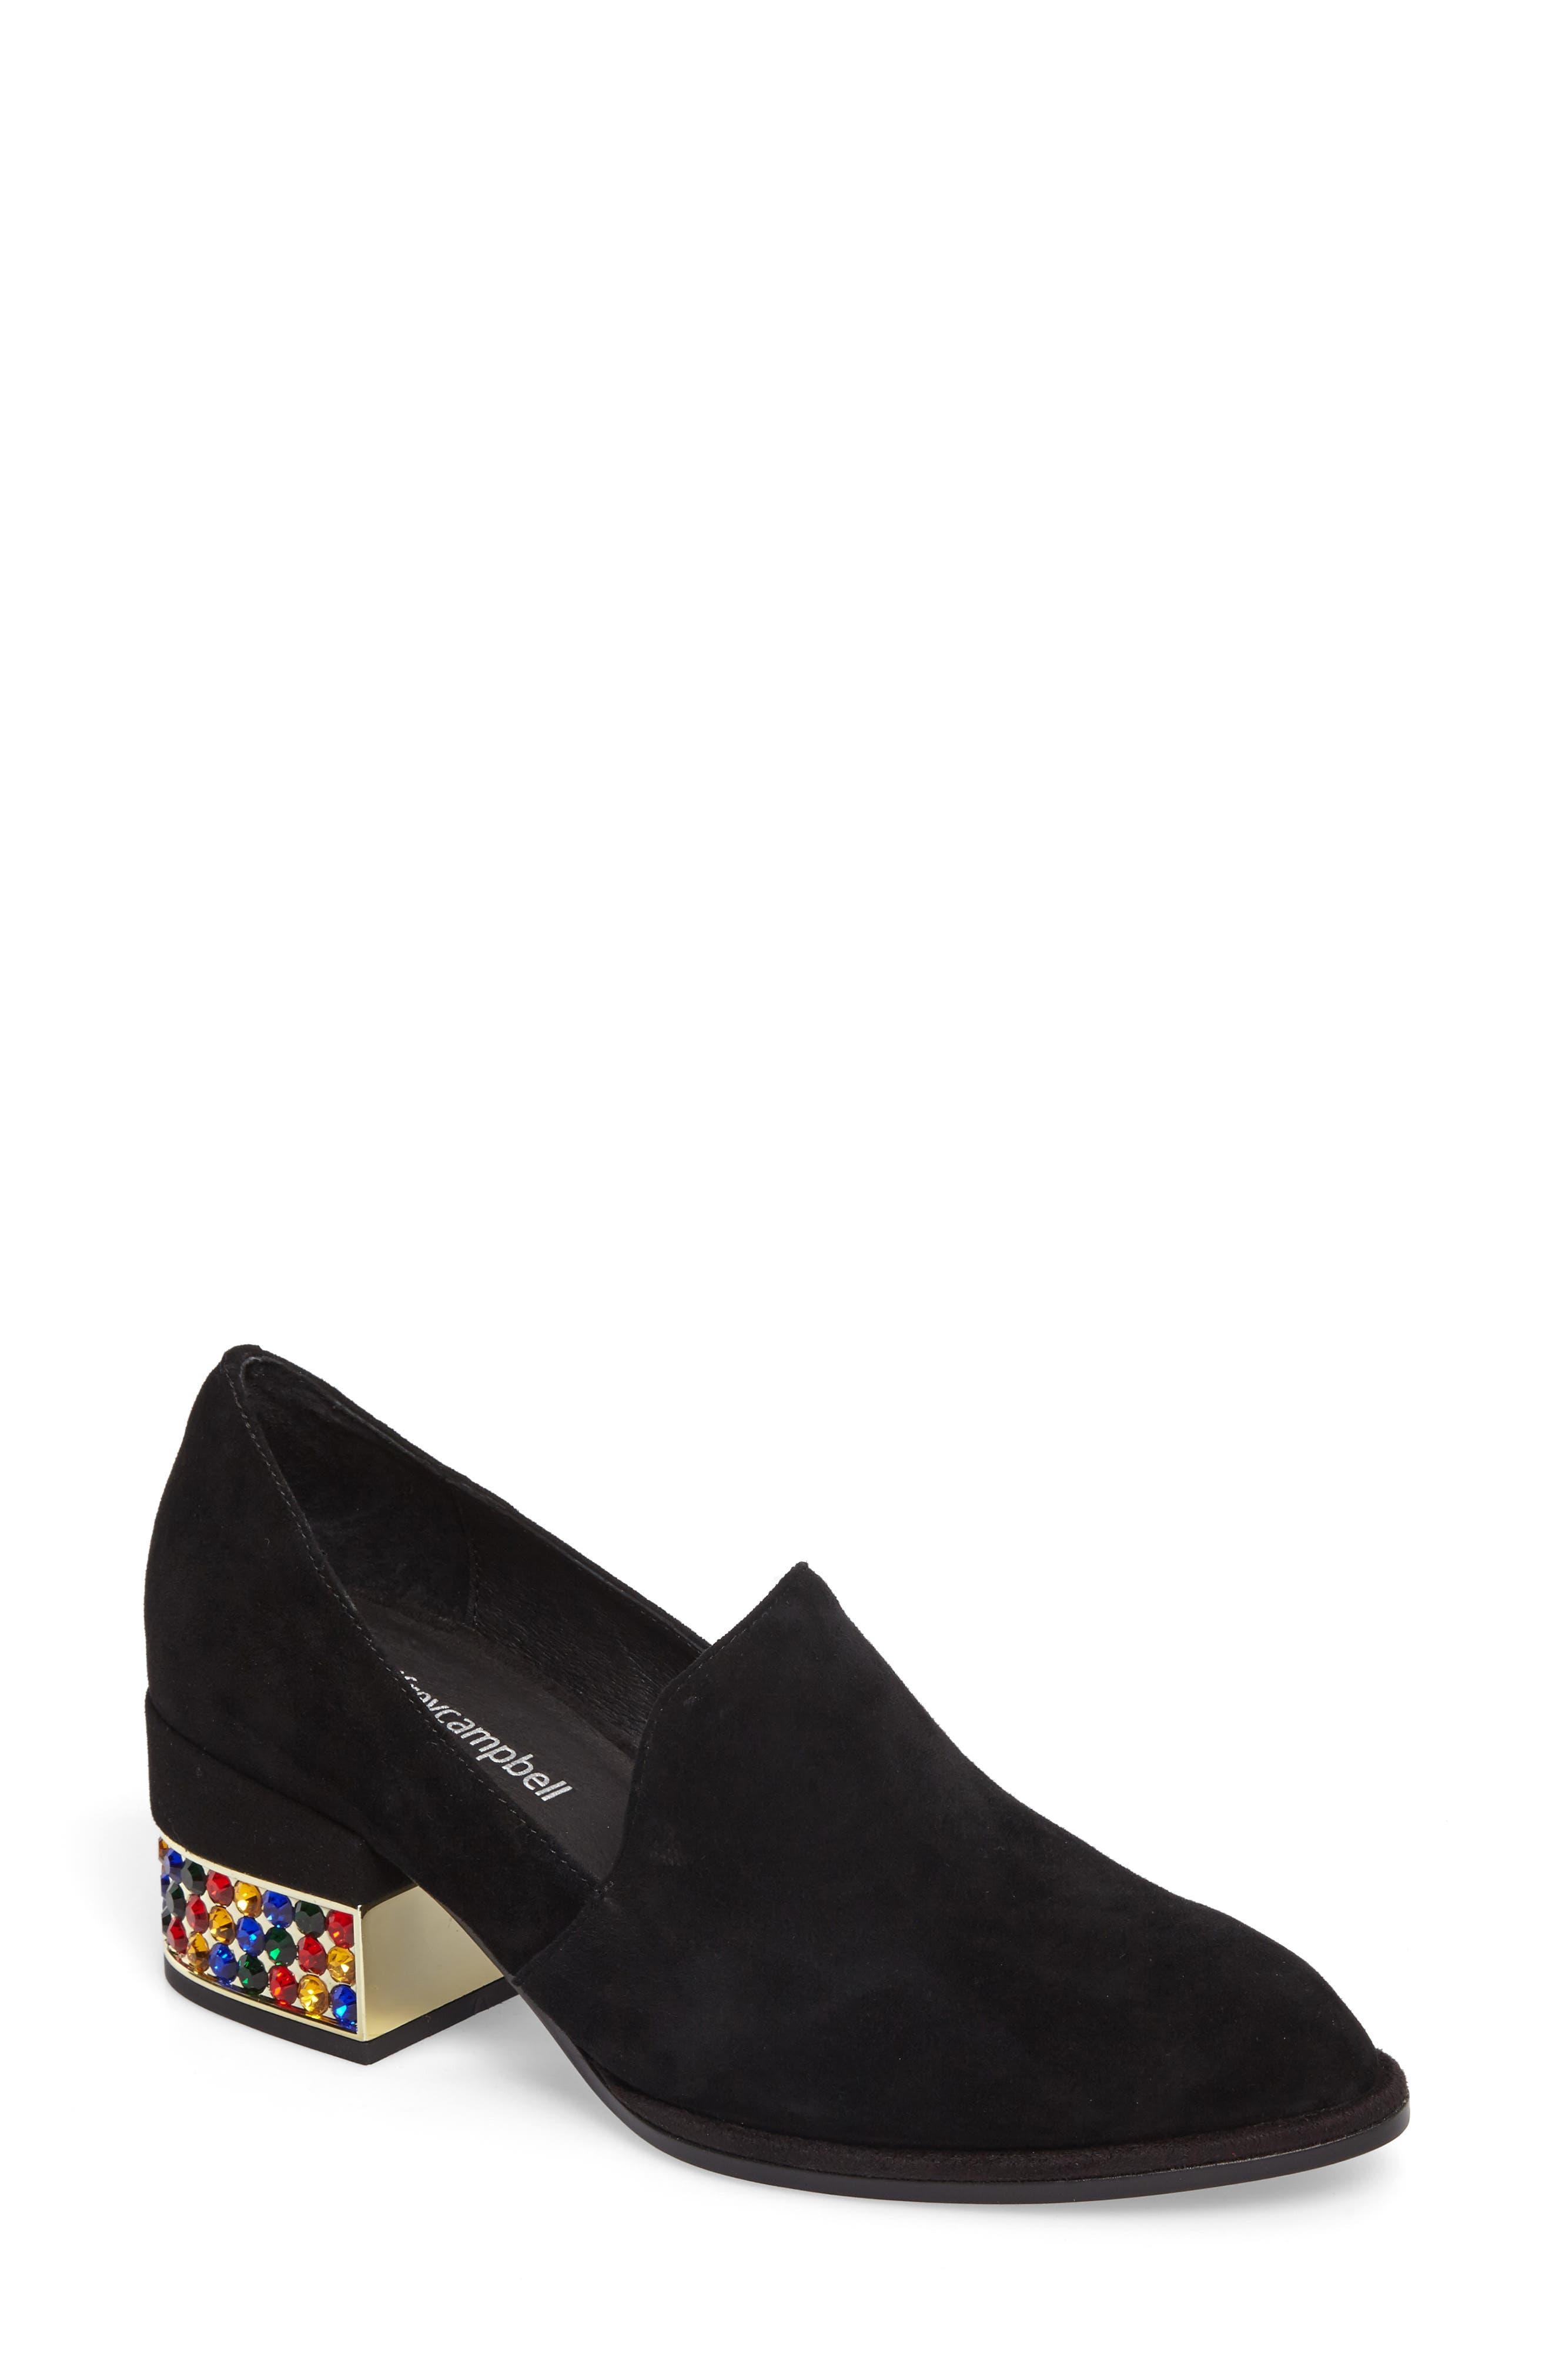 Main Image - Jeffrey Campbell Serlin Jeweled Heel Loafer (Women)